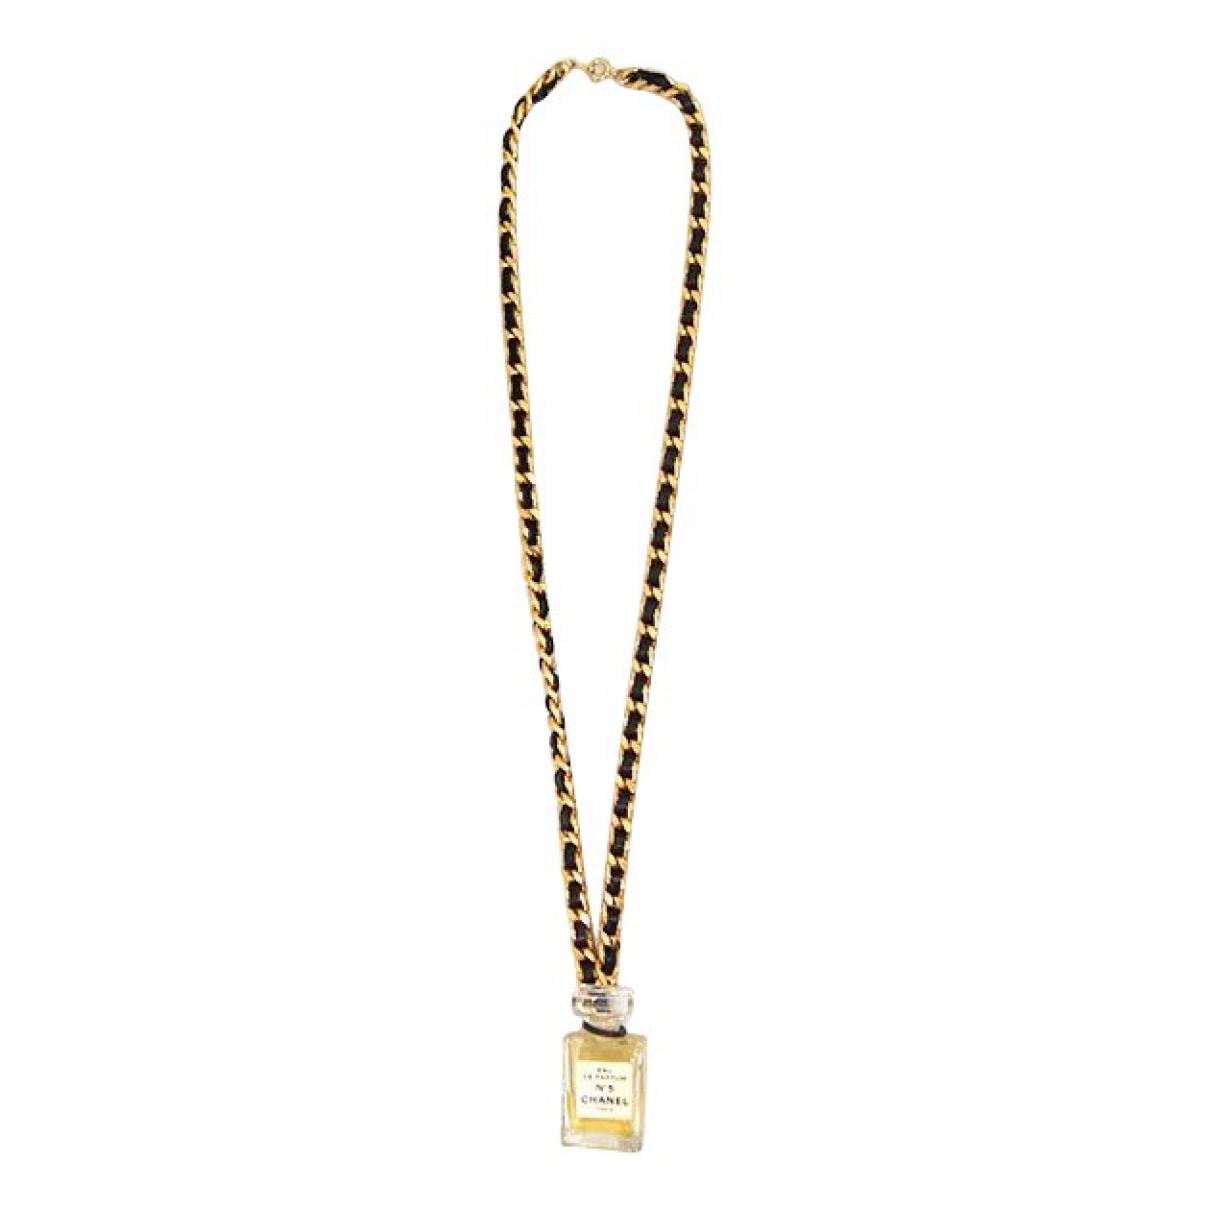 Collar CHANEL Chanel